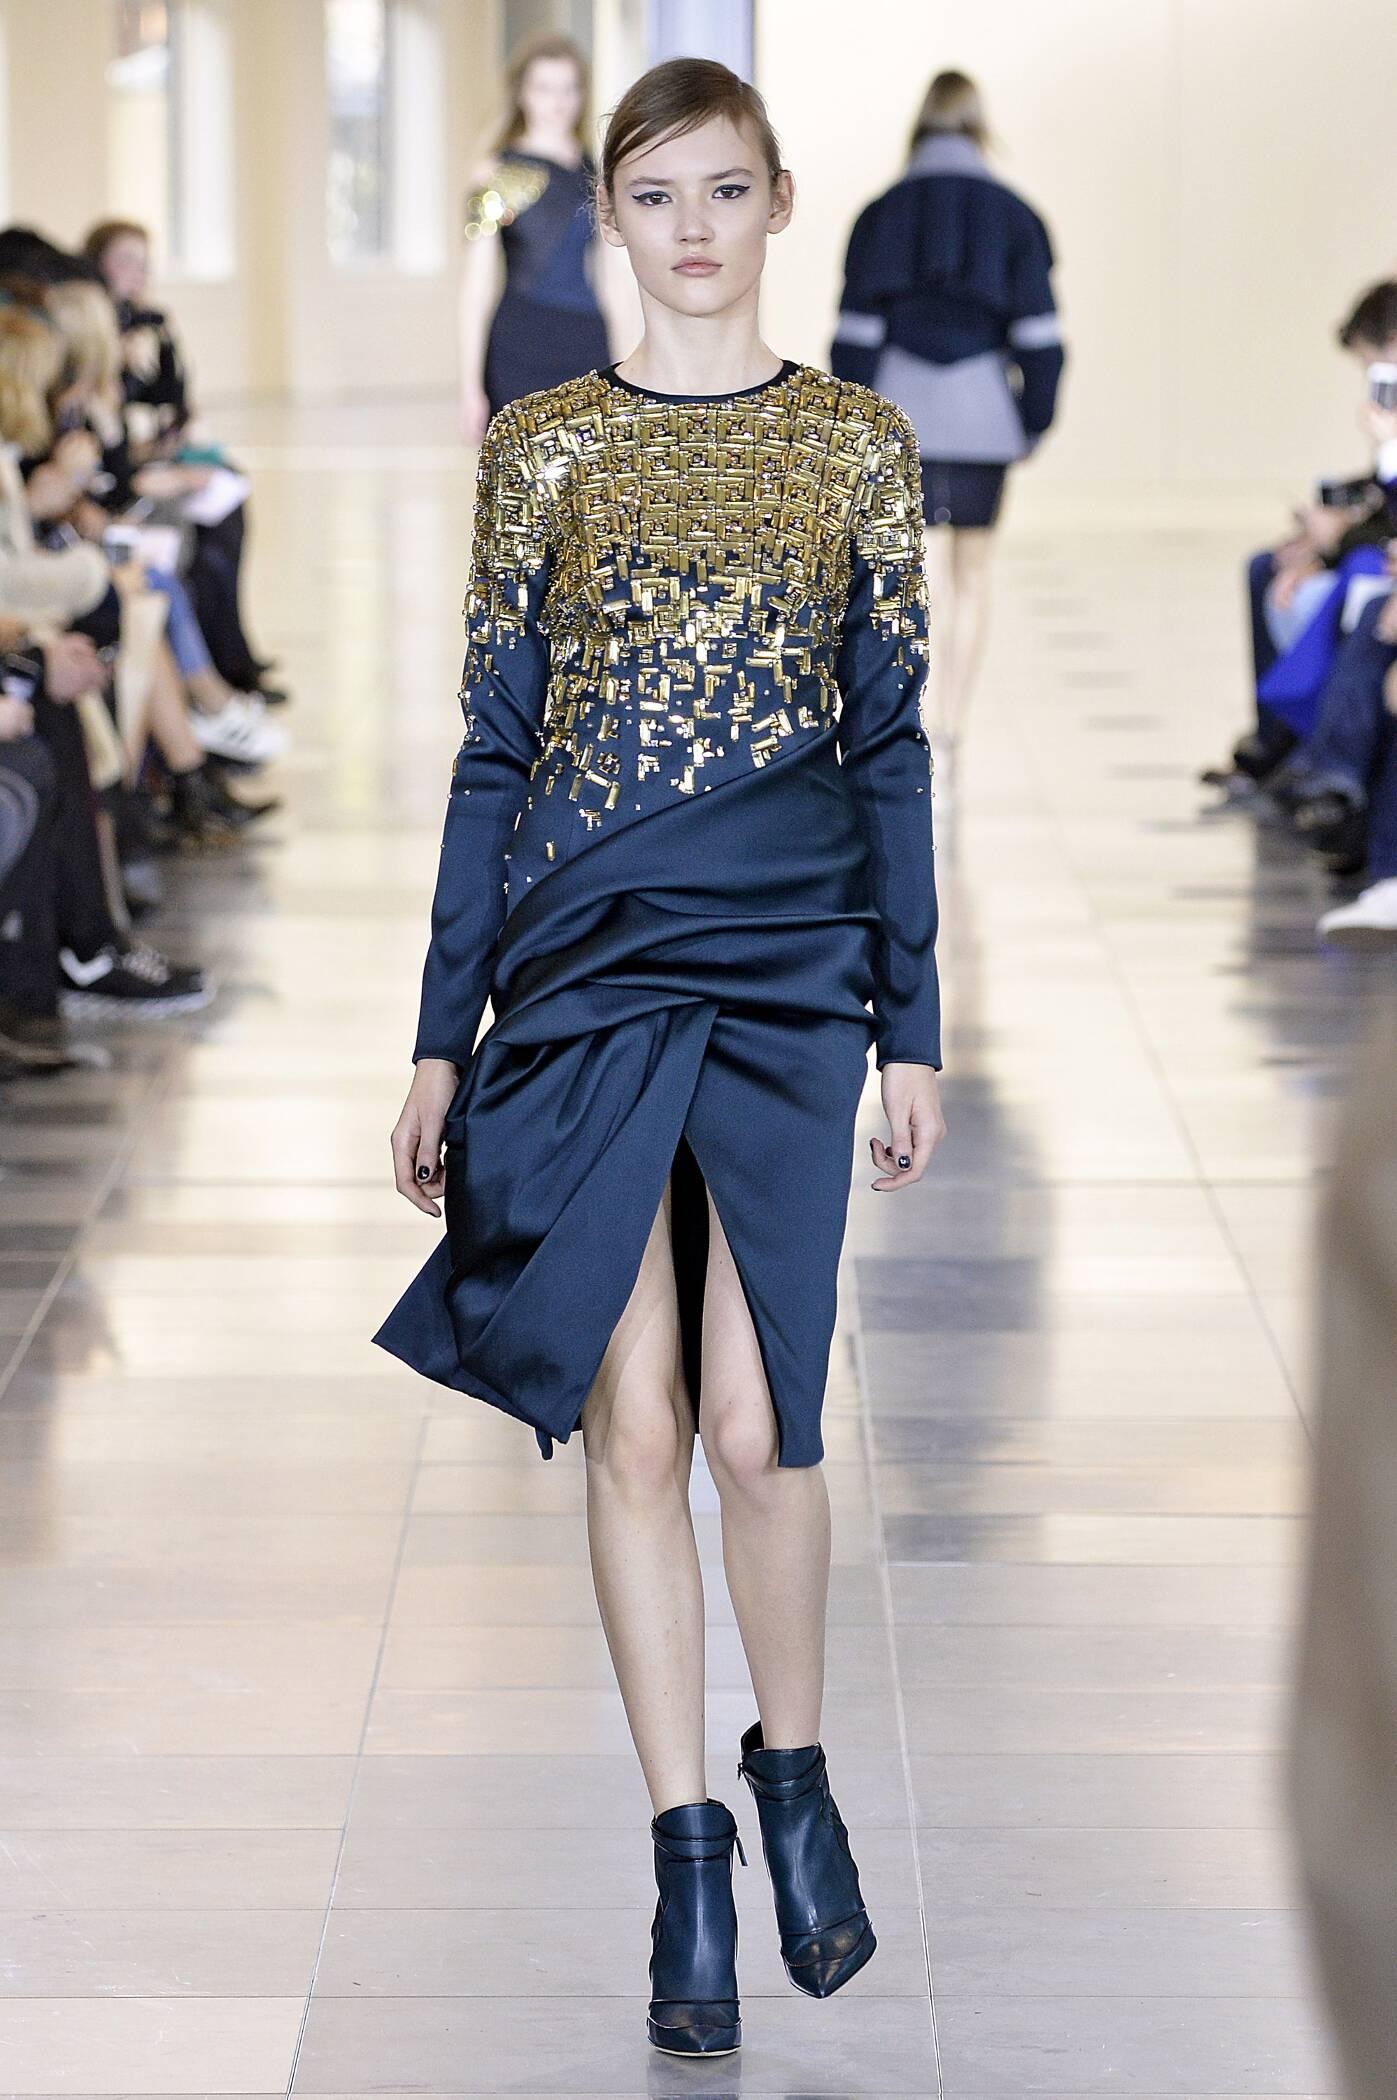 Runway Antonio Berardi Fashion Show Winter 2015